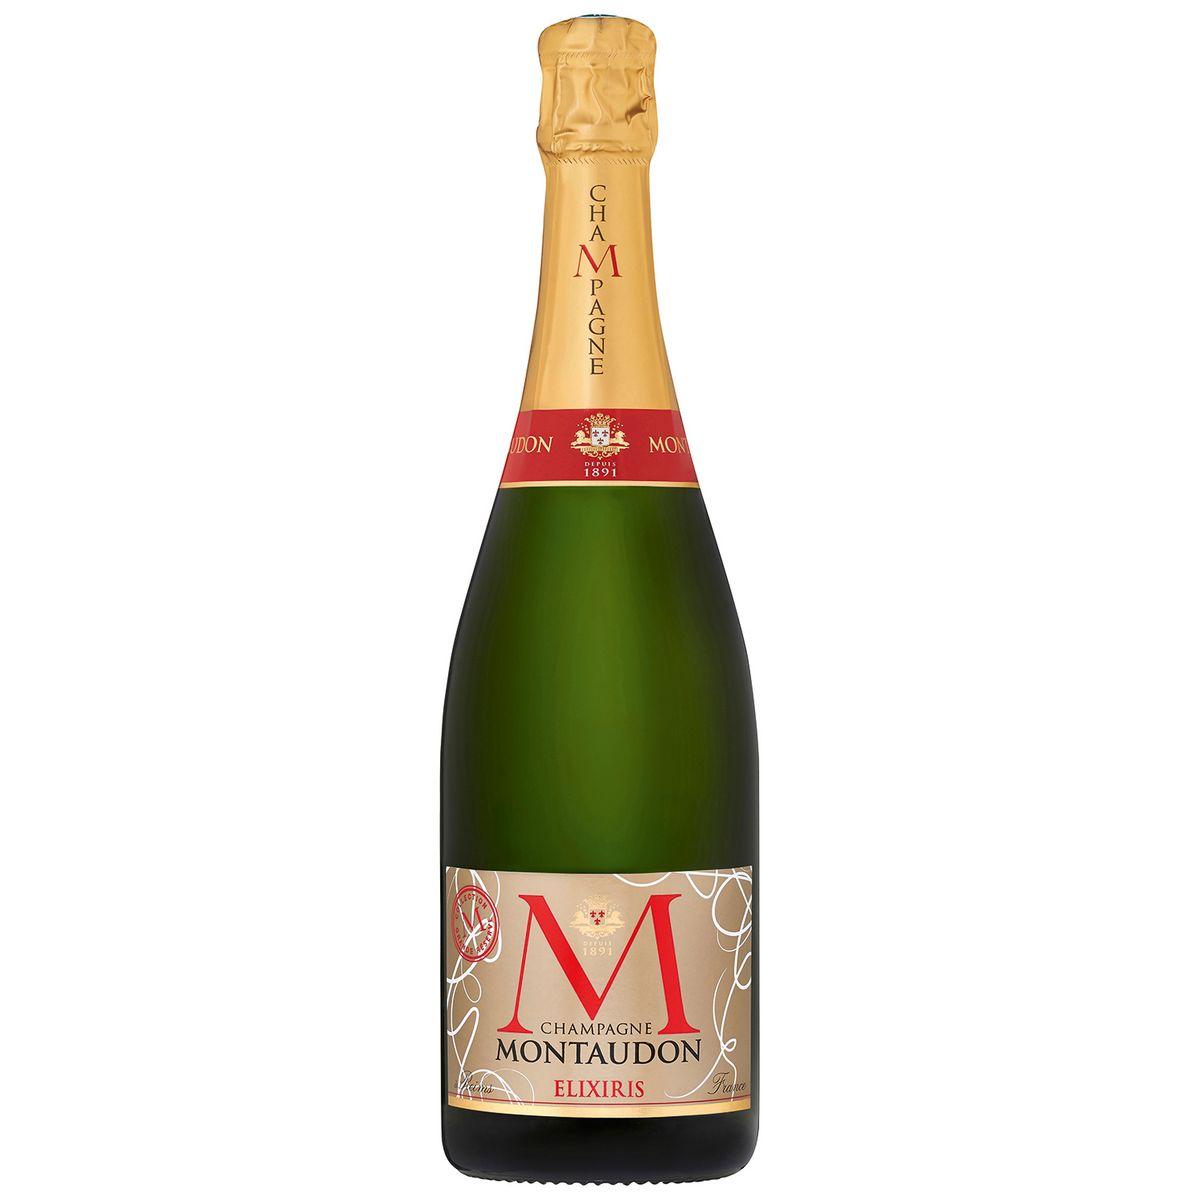 AOP Champagne brut Elixiris